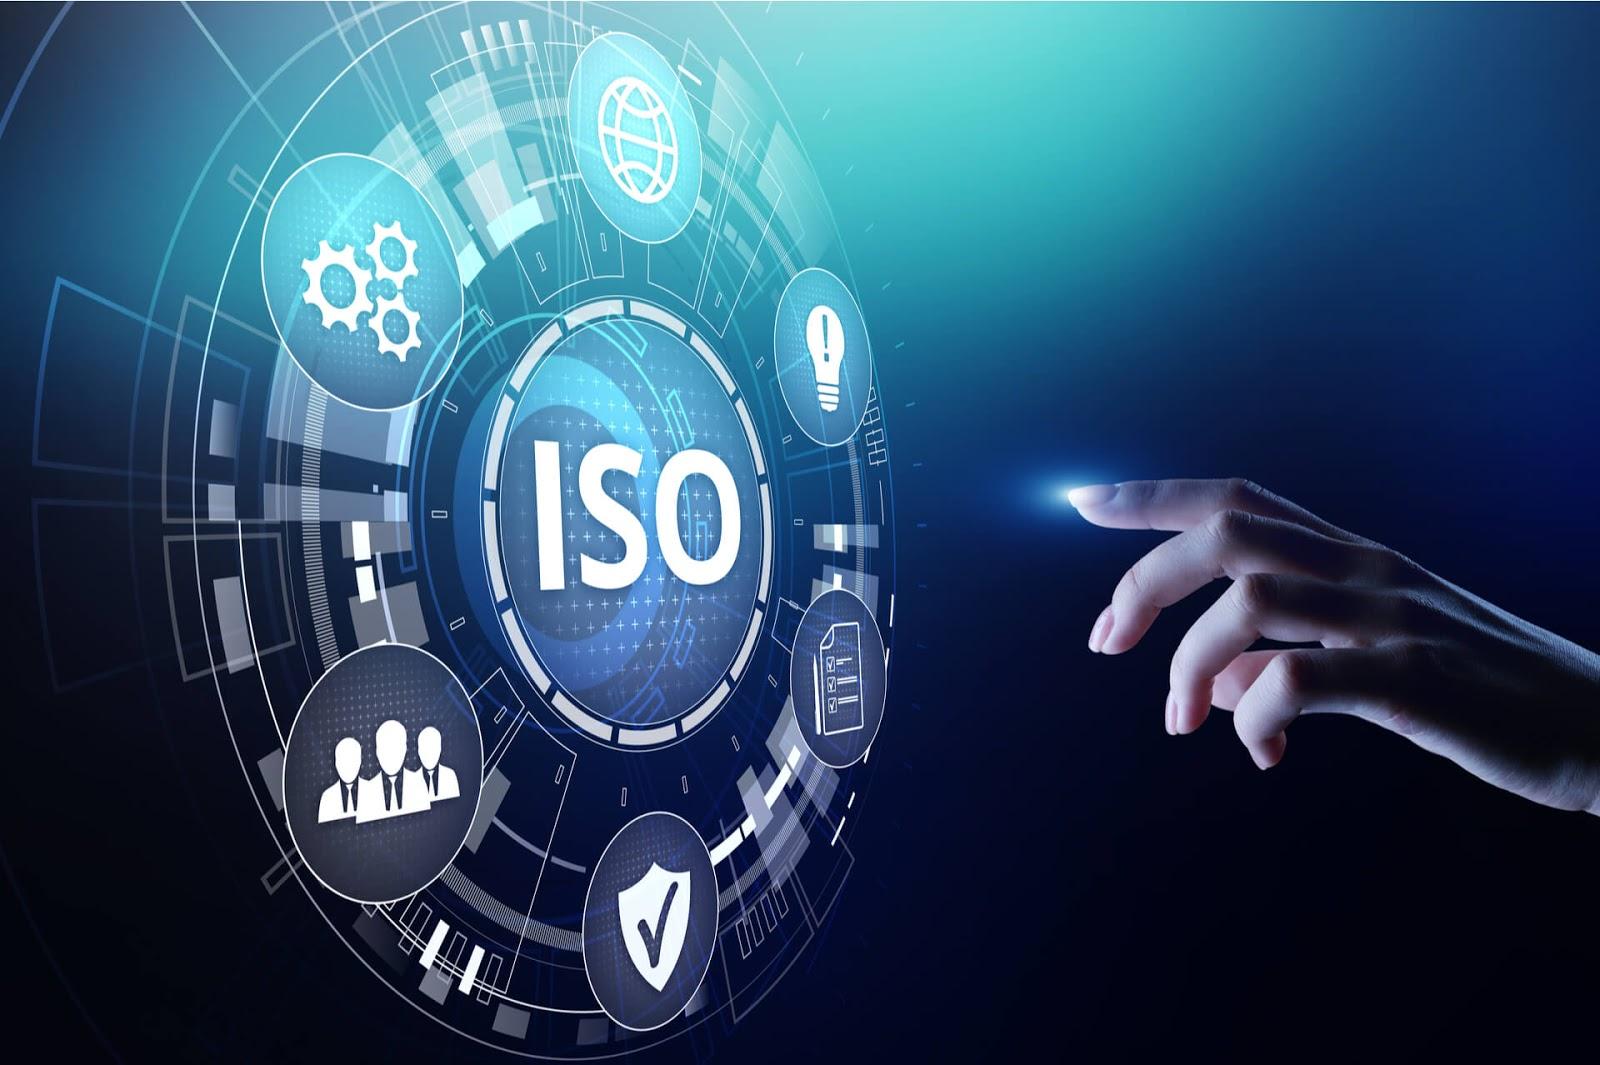 Certificare ISO - De ce este importanta? - Stratos.ro